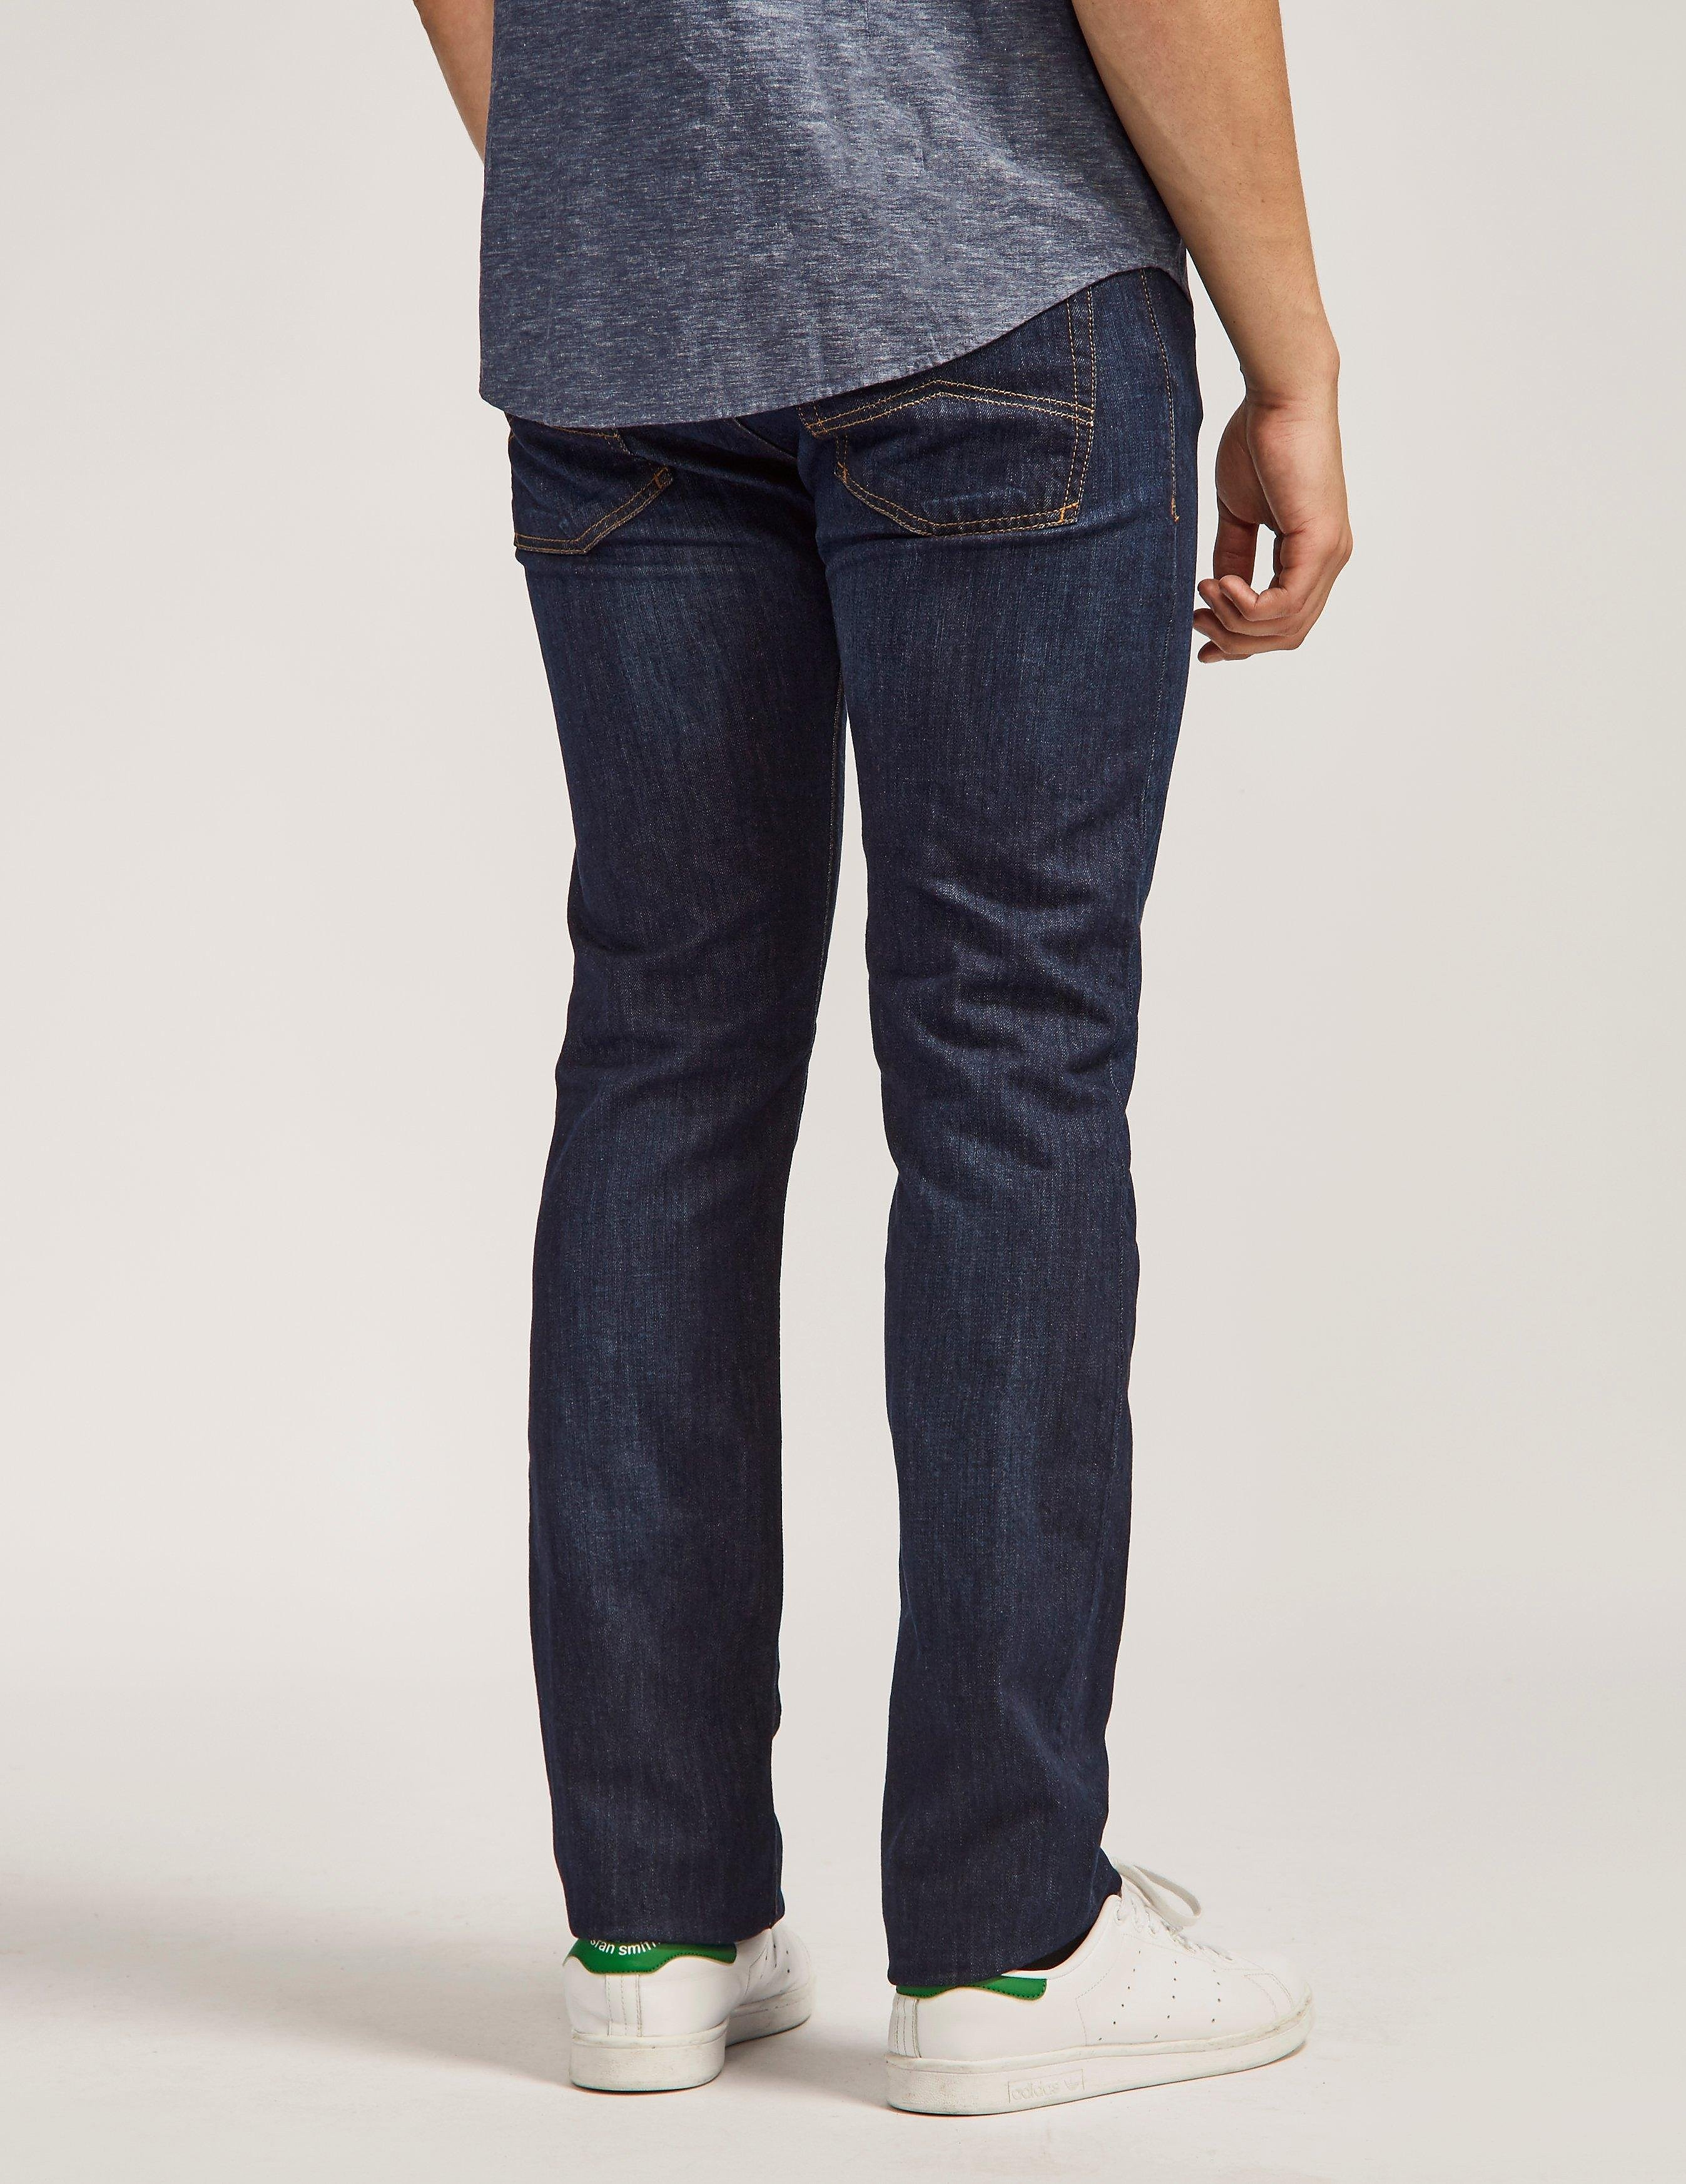 Armani Jeans J45 Regular Tapered Jean - Long